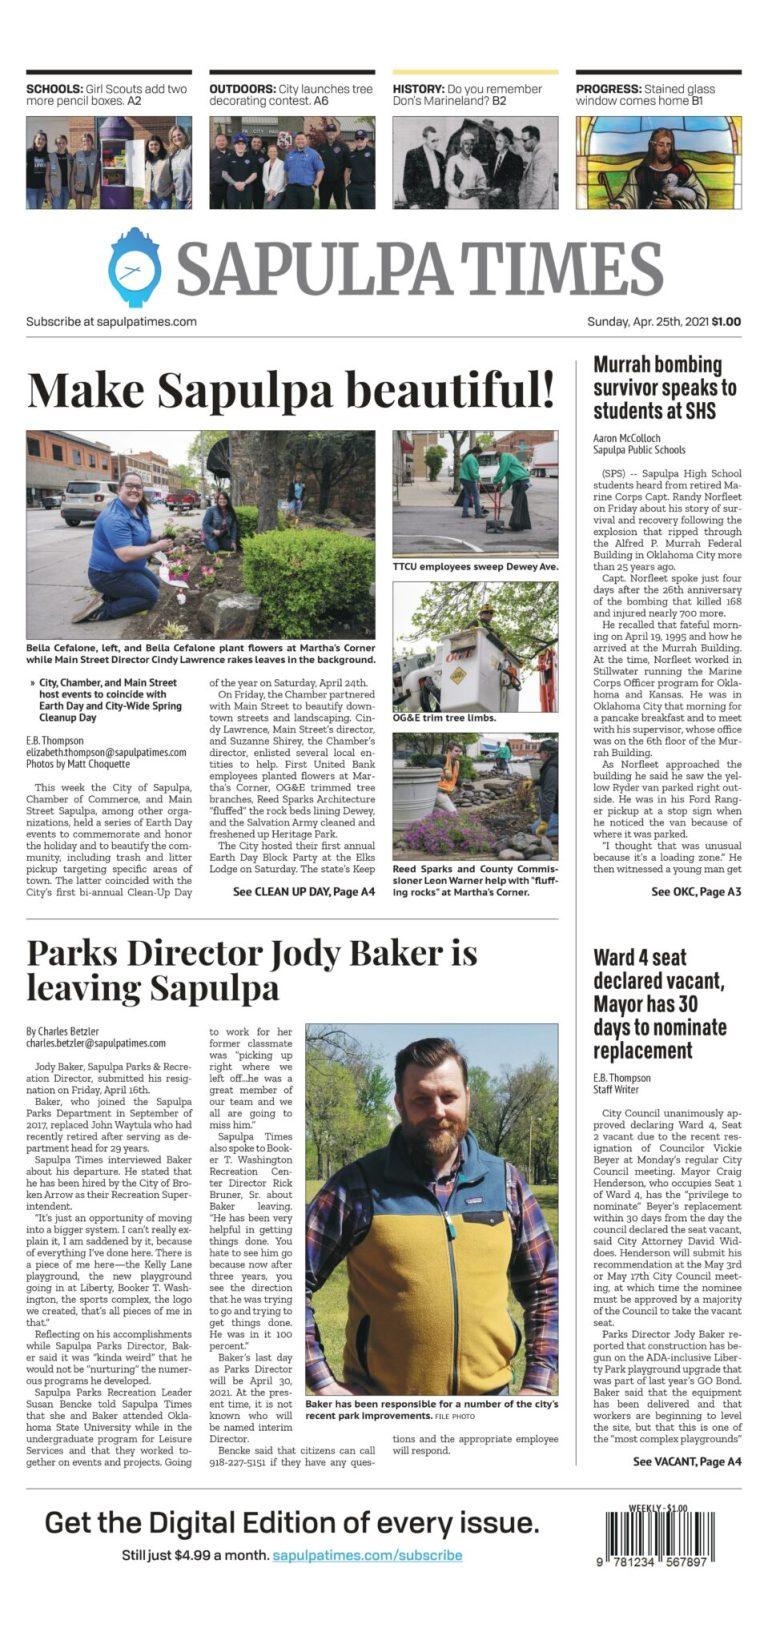 Sapulpa Times Digital Edition 04/25/2021